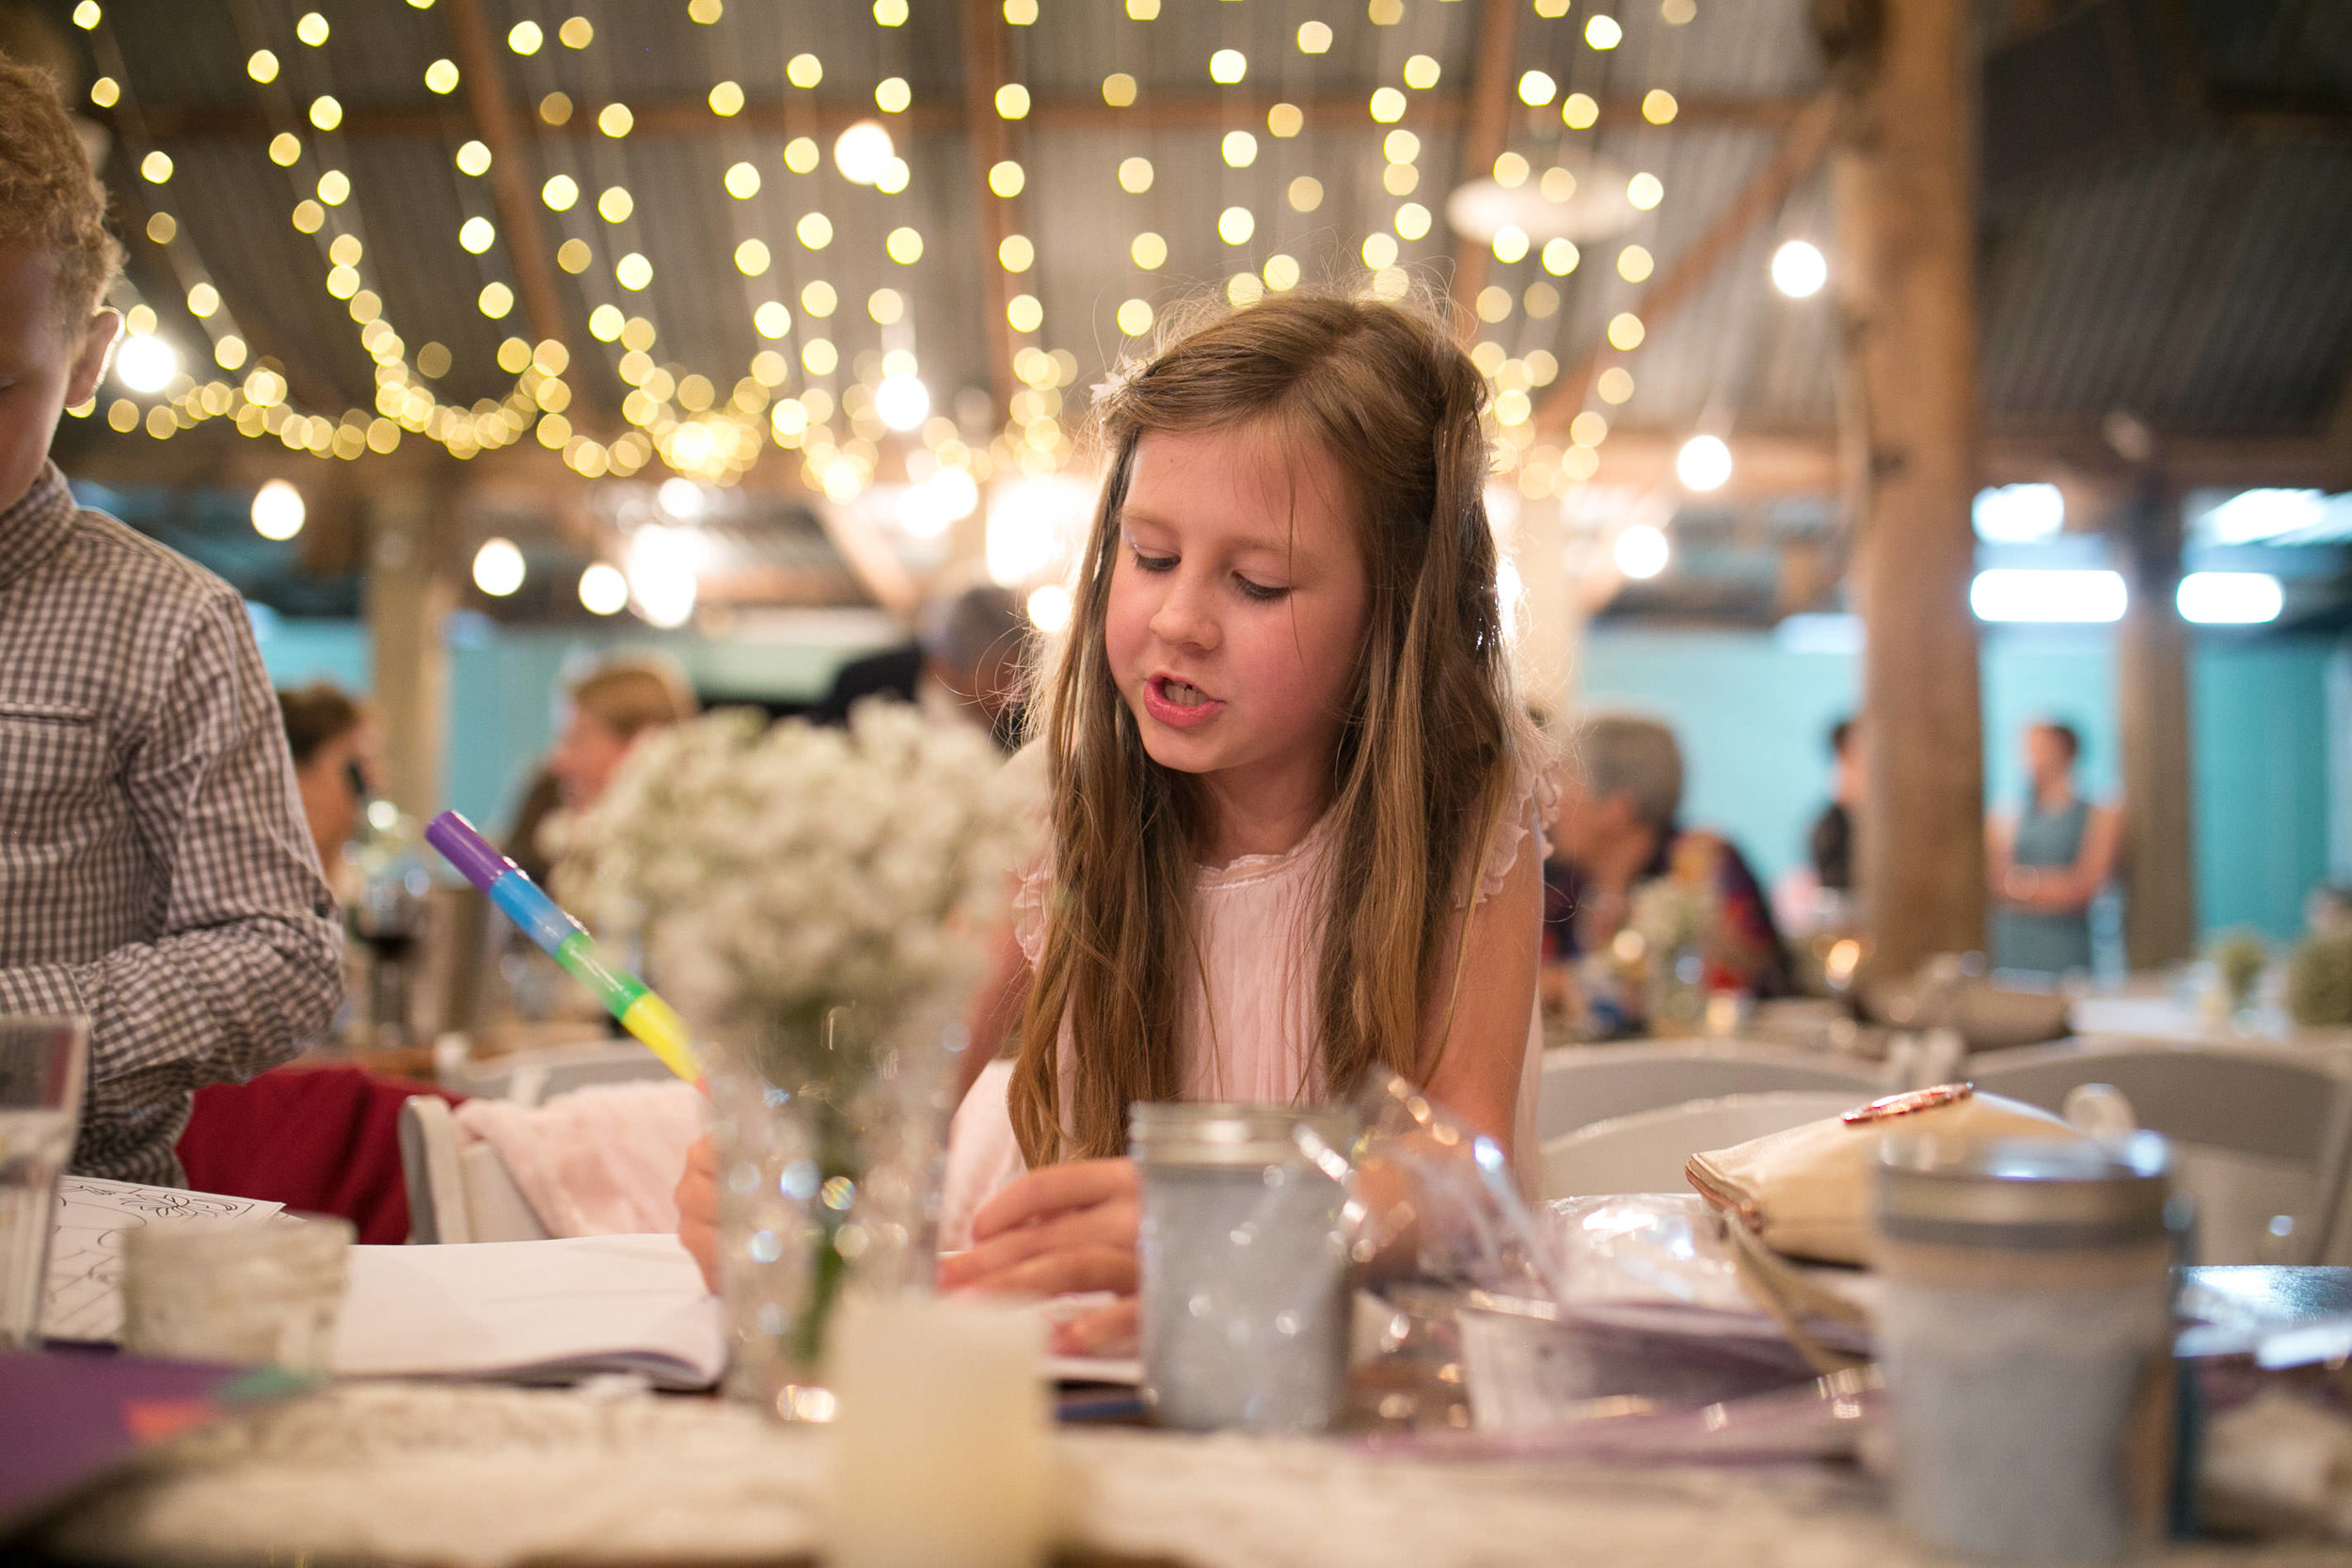 True North Photography_Boomerang Farm_Stacey and Isaac_Gold Coast Wedding_Barm Wedding_Hinterland Wedding-205.jpg